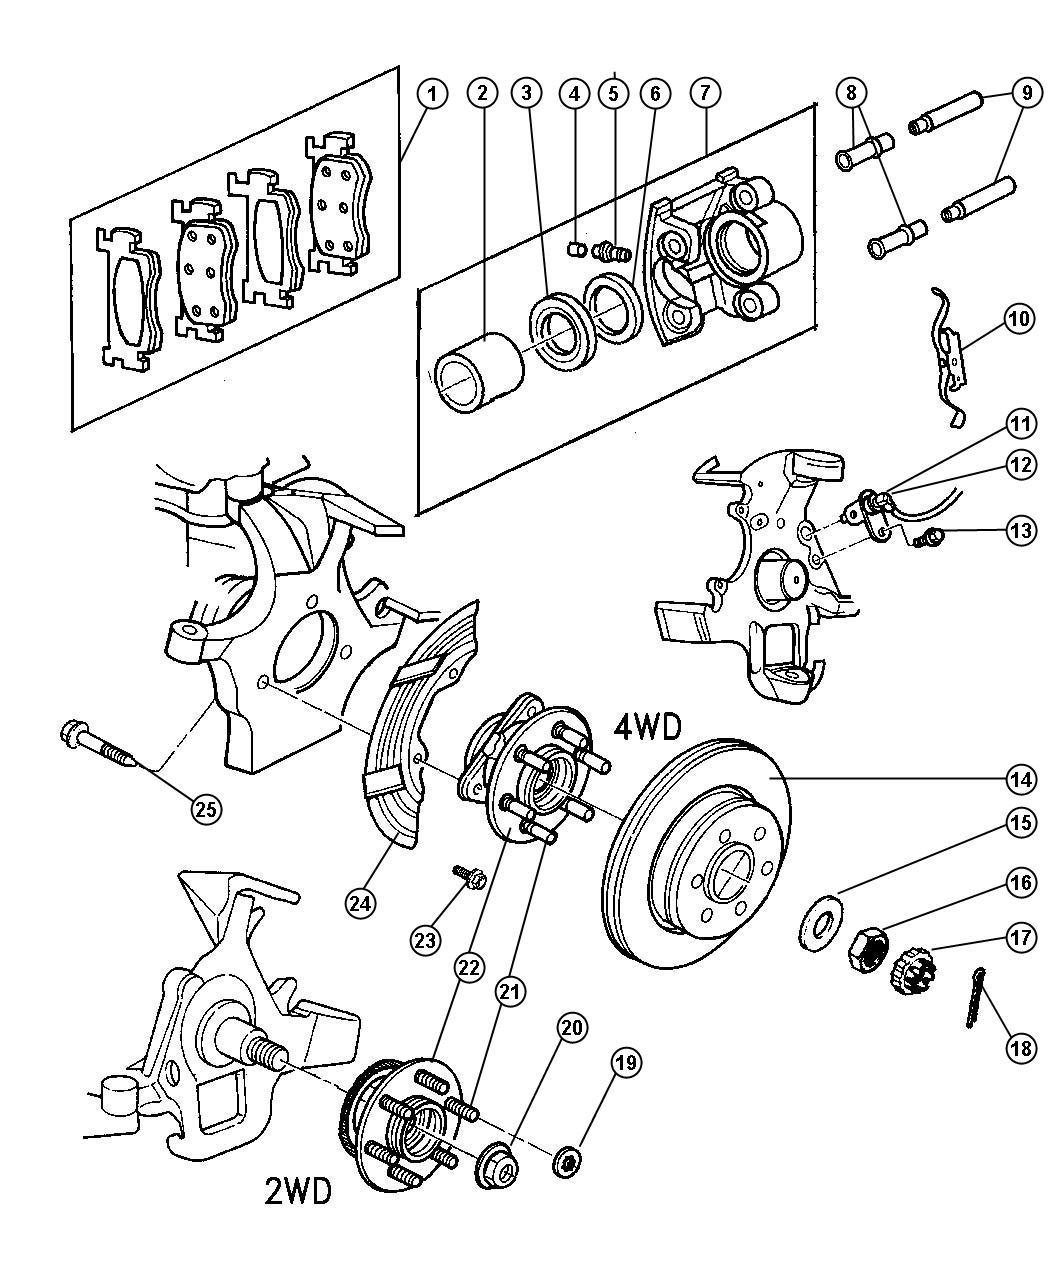 1999 dodge ram 1500 front axle diagram 2002 subaru impreza stereo wiring durango caliper left disc brake reman loaded